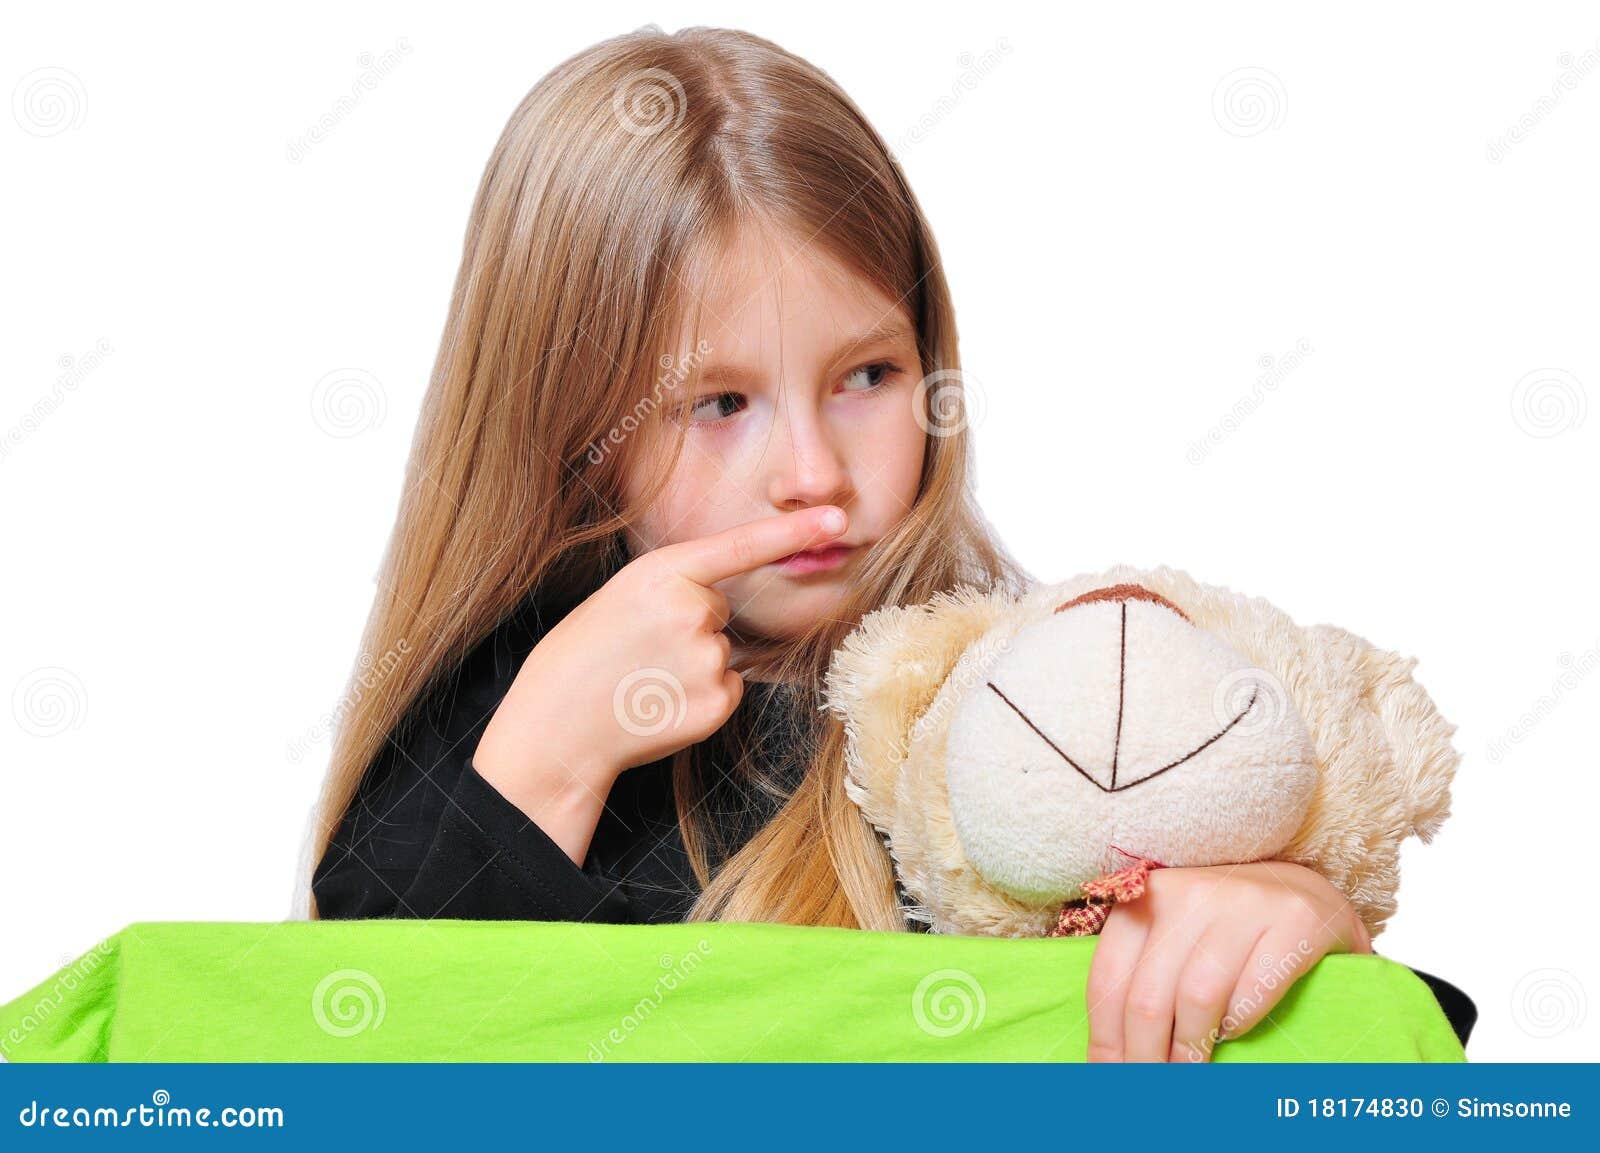 Funny Girl Looking Teddy Stock Photo - Image: 18174830